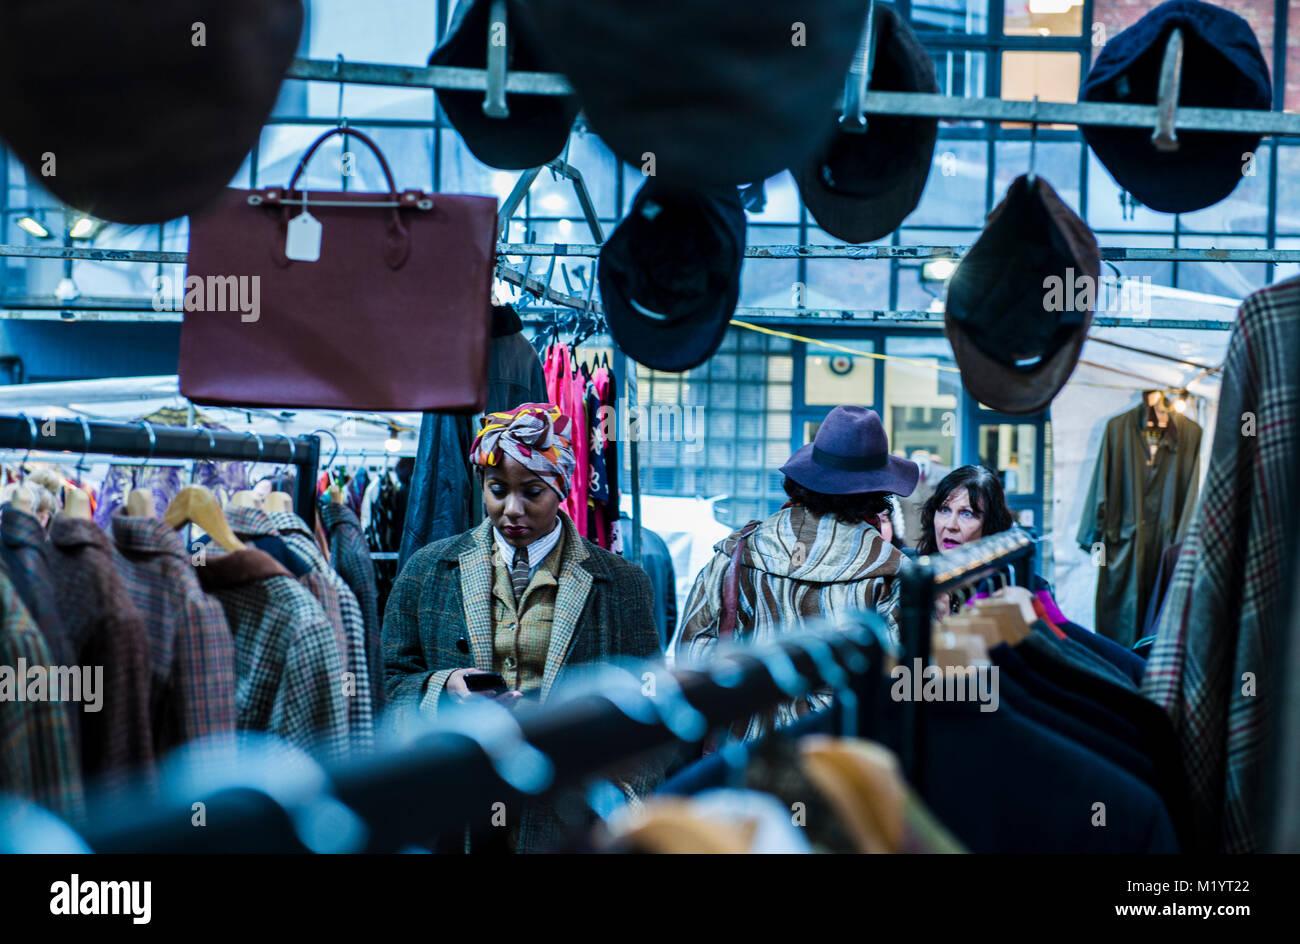 People in clothes market, Portobello, London, England - Stock Image